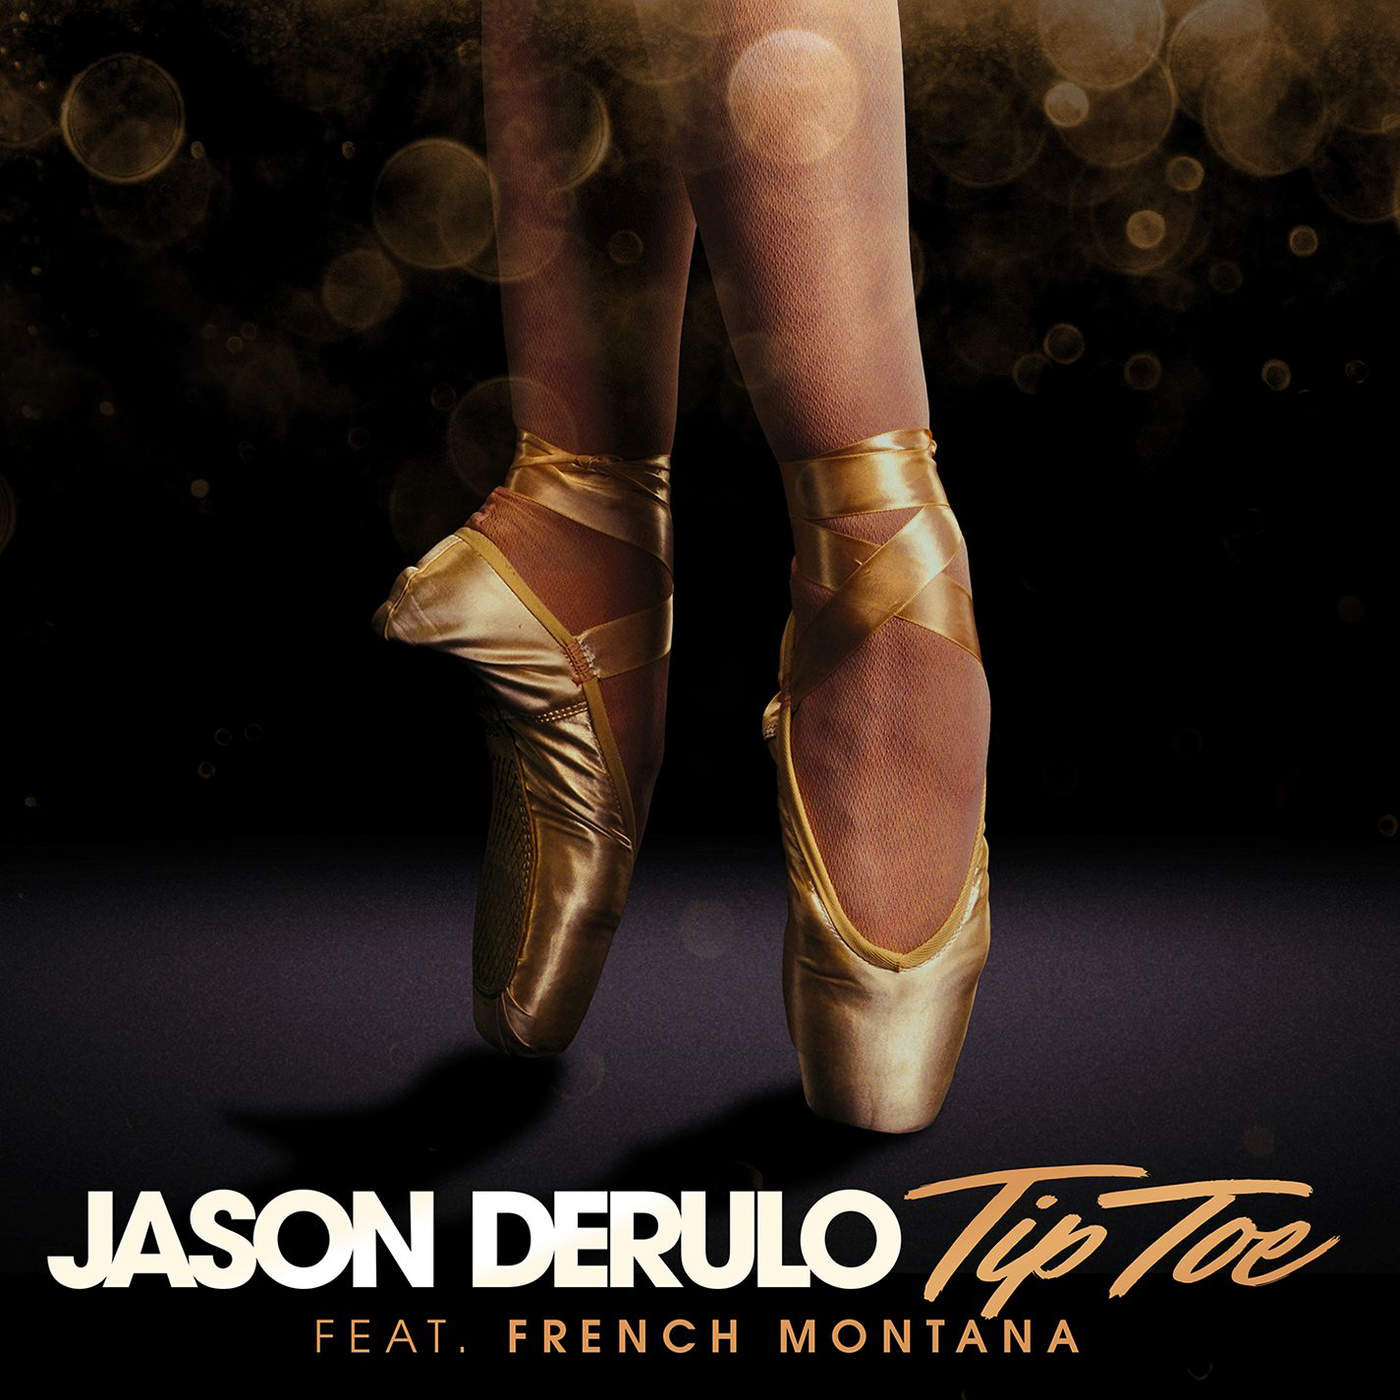 Jason Derulo - Tip Toe (feat. French Montana) - Single